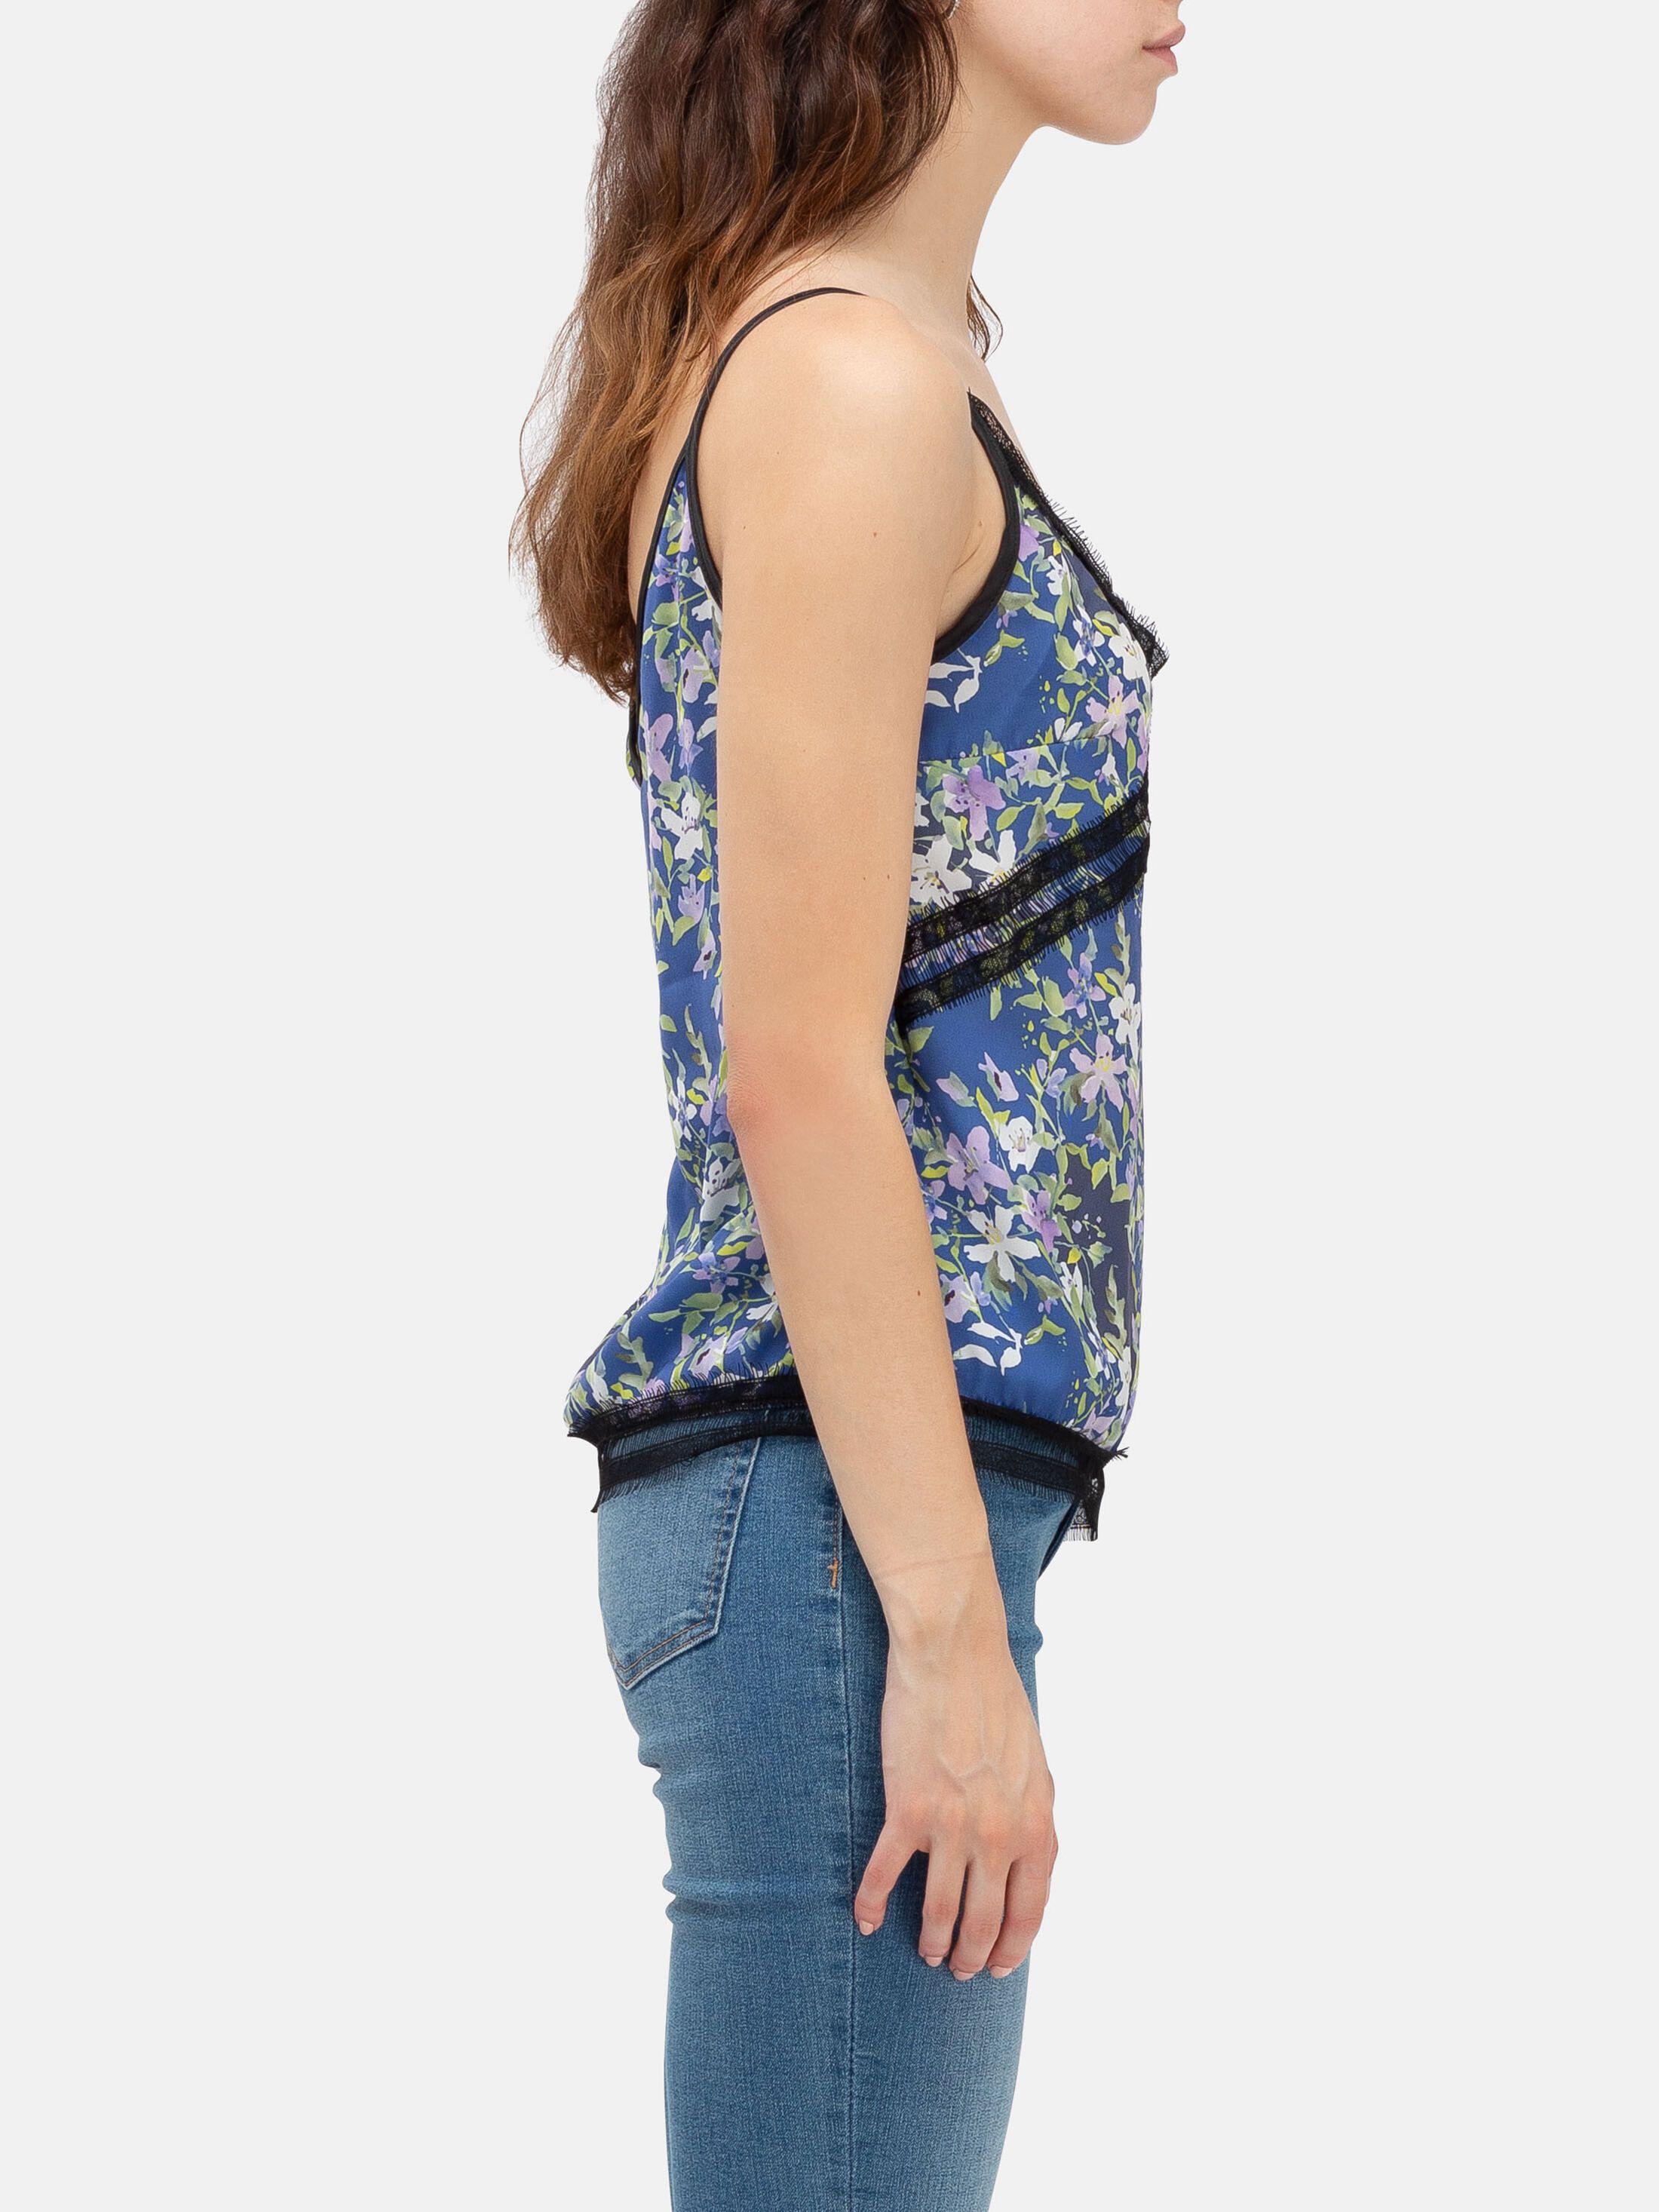 custom printed camisole